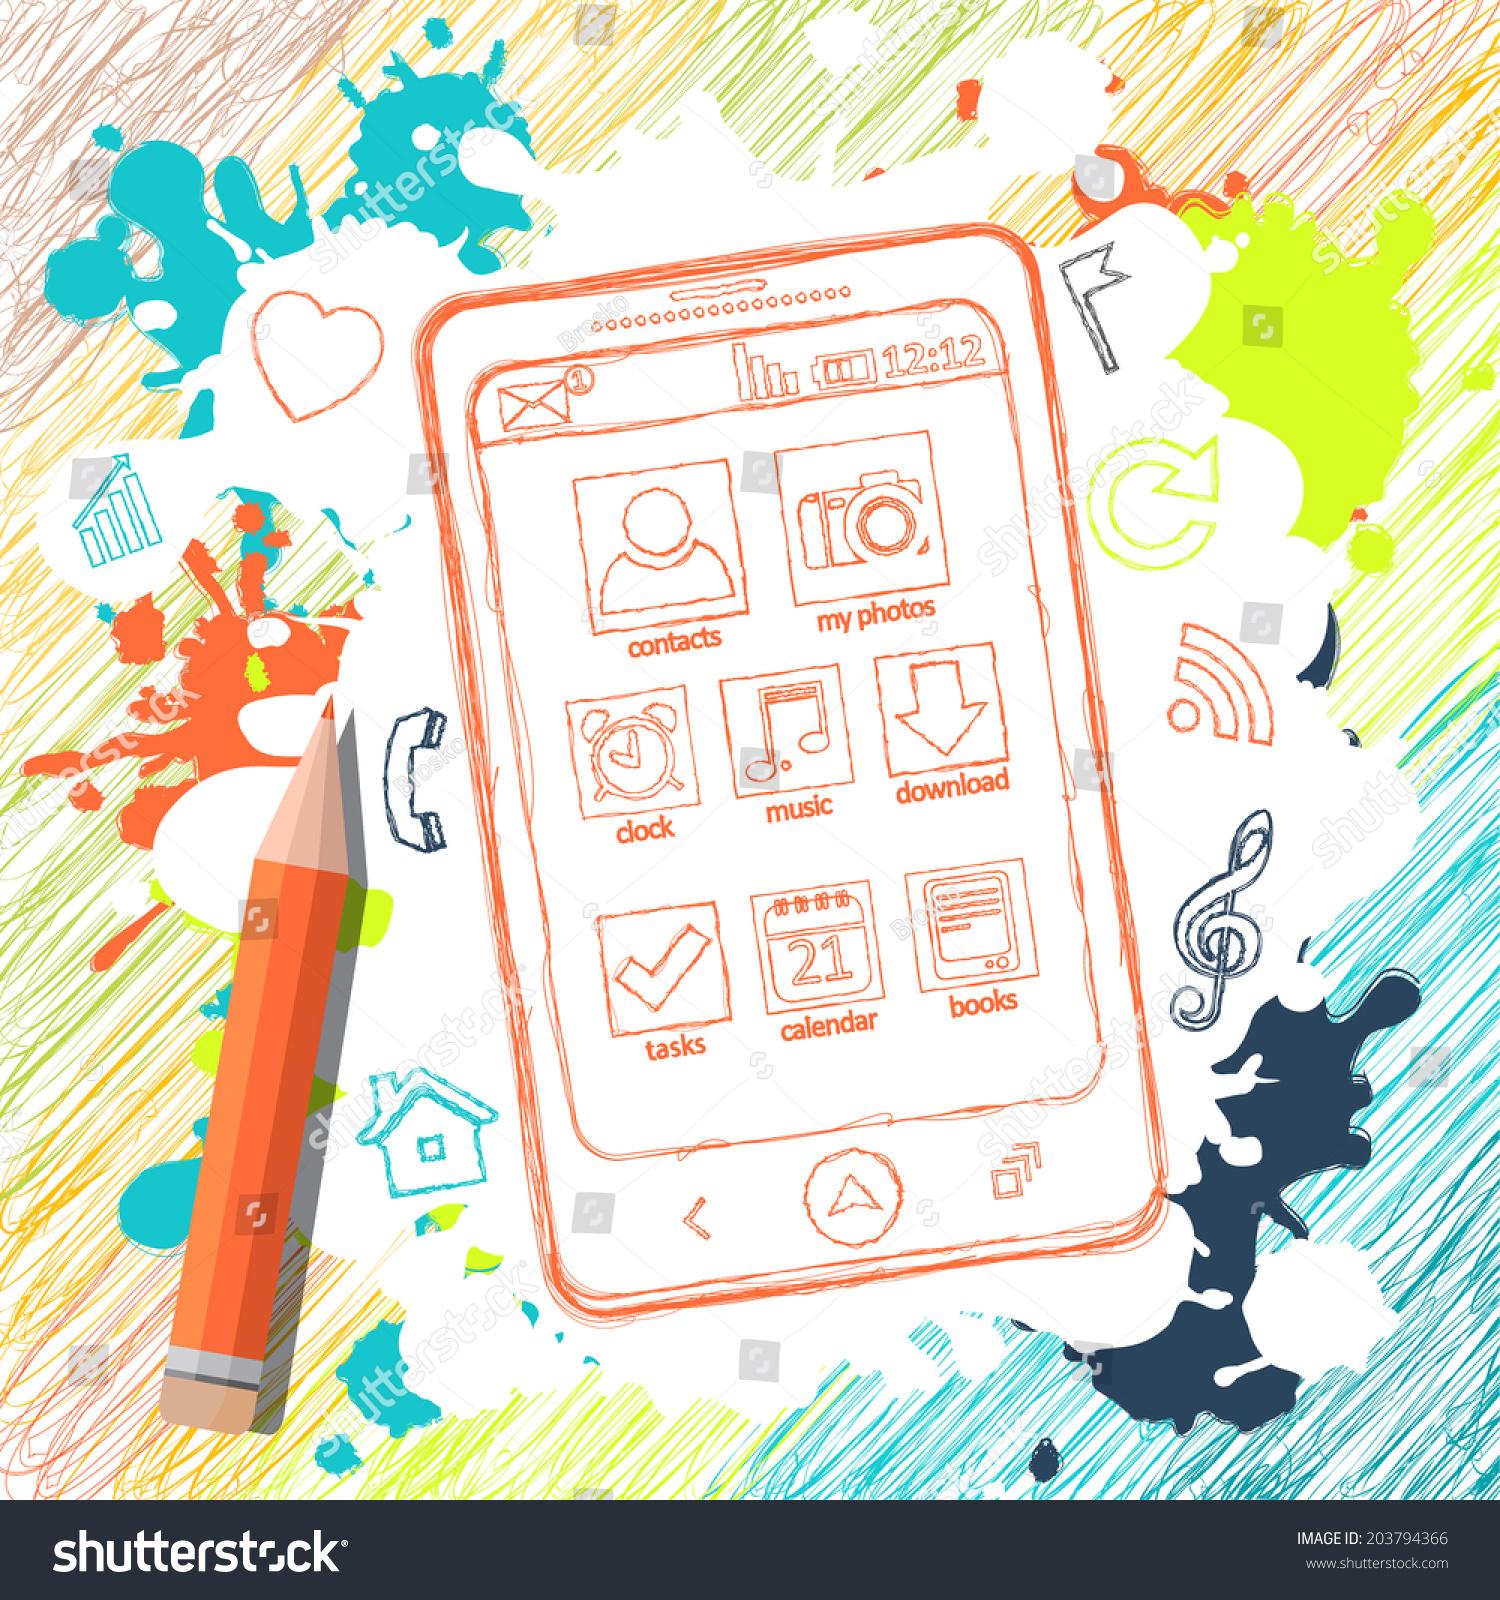 Pencil sketch mobile phone applications pencil stock vector royalty